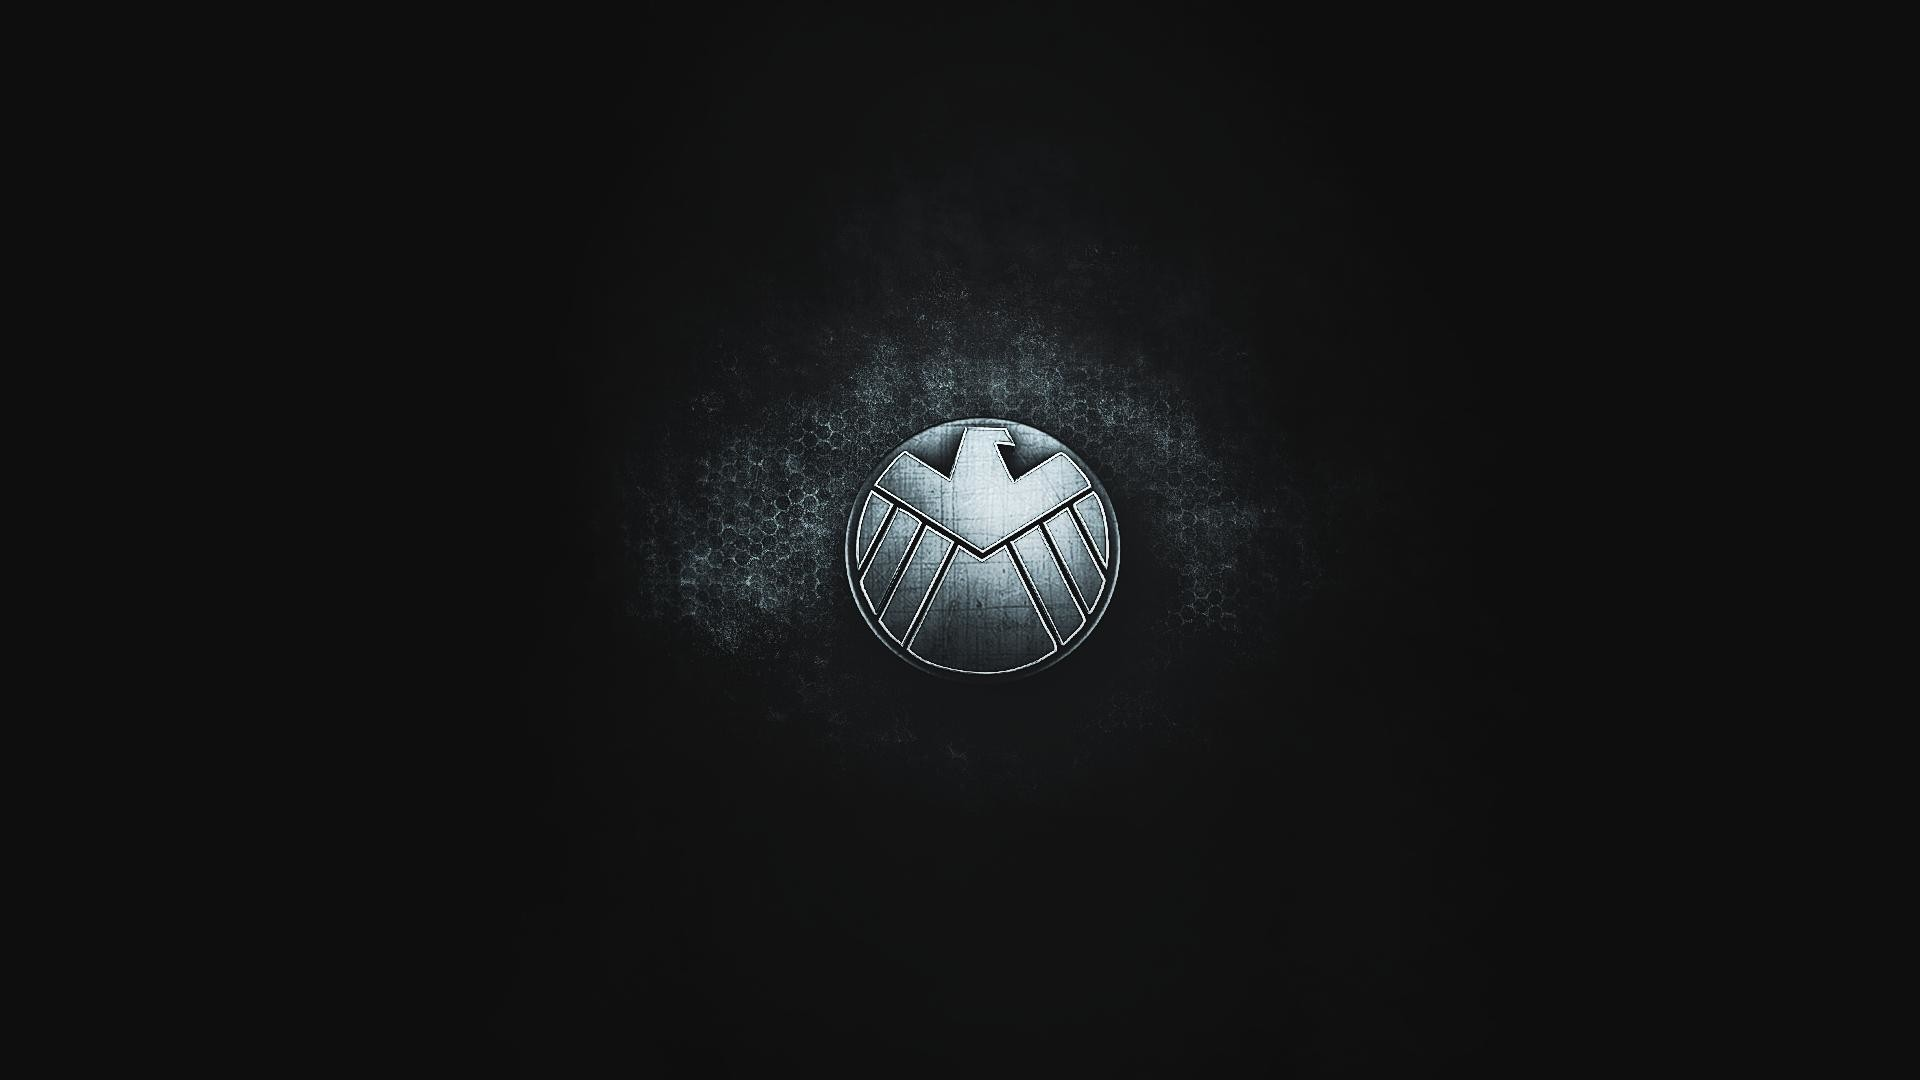 wallpaper.wiki-HD-Wallpapers-Agents-Of-Shield-Free-